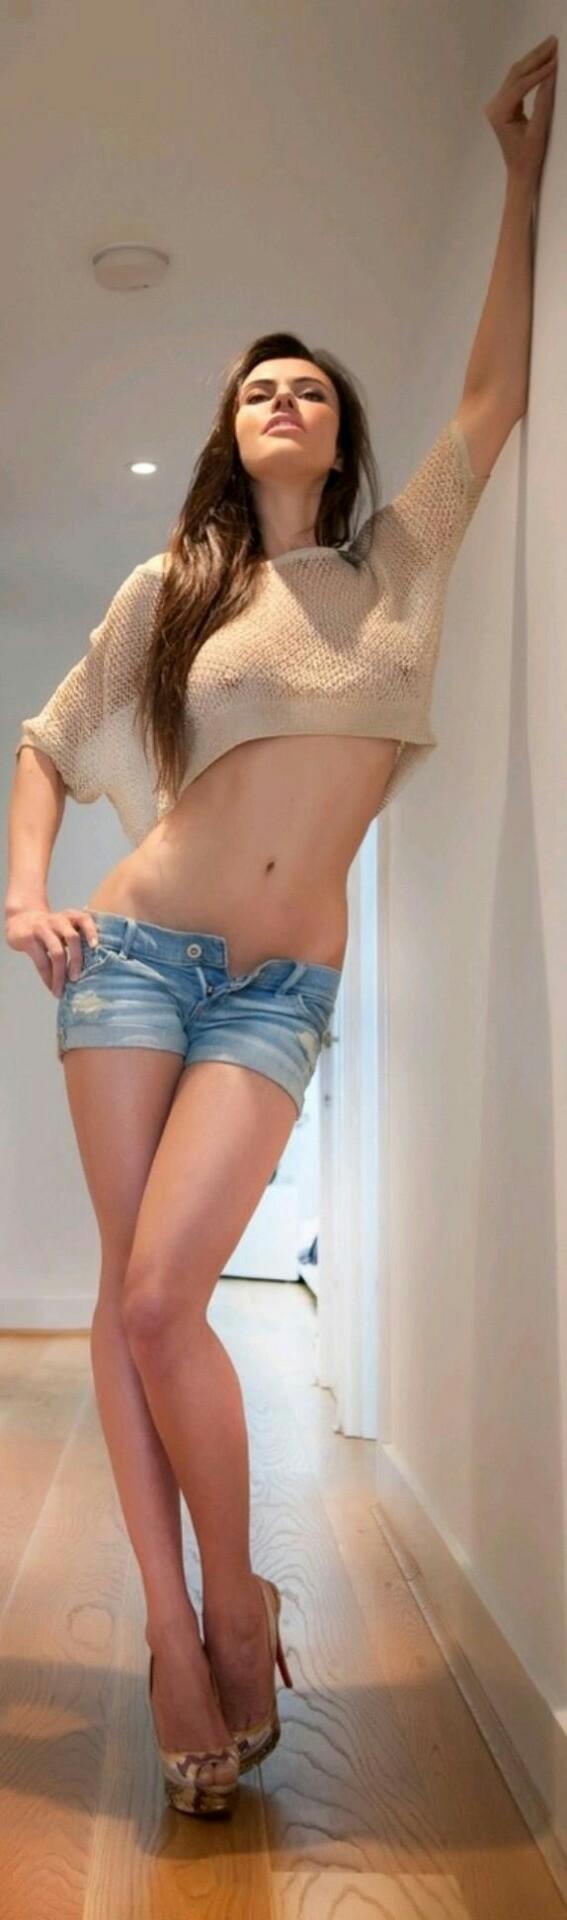 Fyne Girlz regarding pinhaikal and friends on indo sexy model   pinterest   brunettes